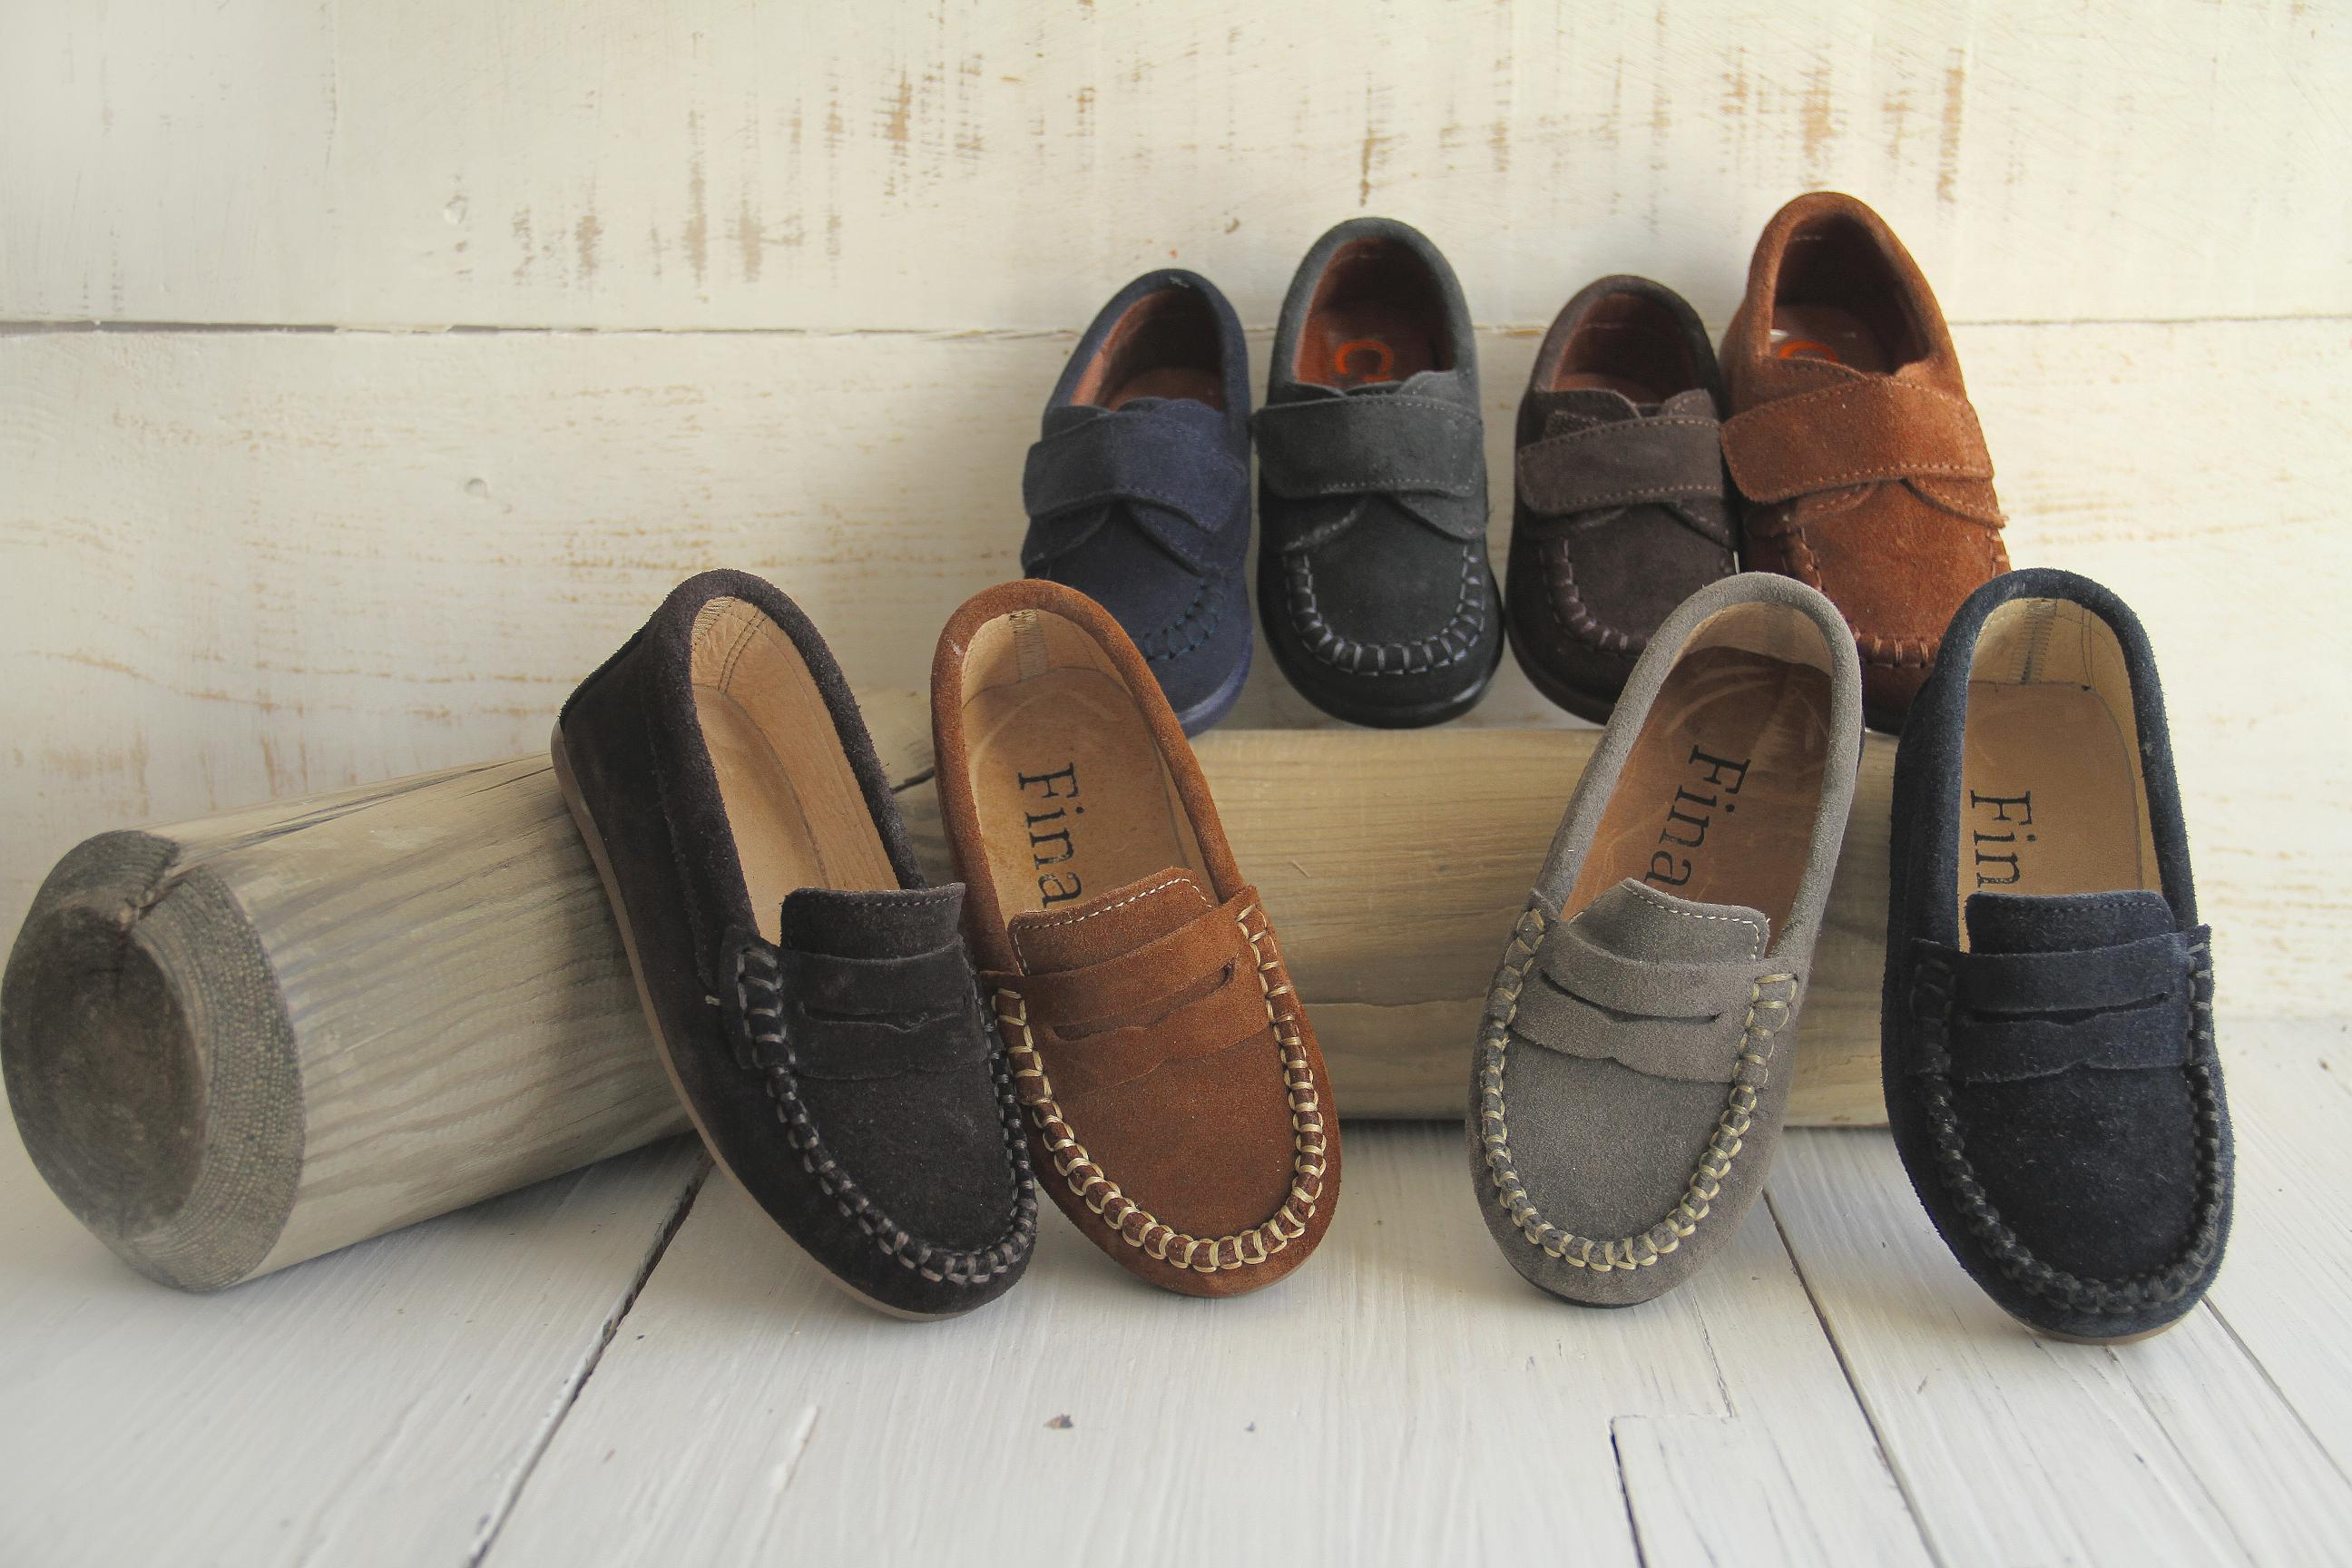 Zapatos azul marino de primavera infantiles c5WZf6uAbl